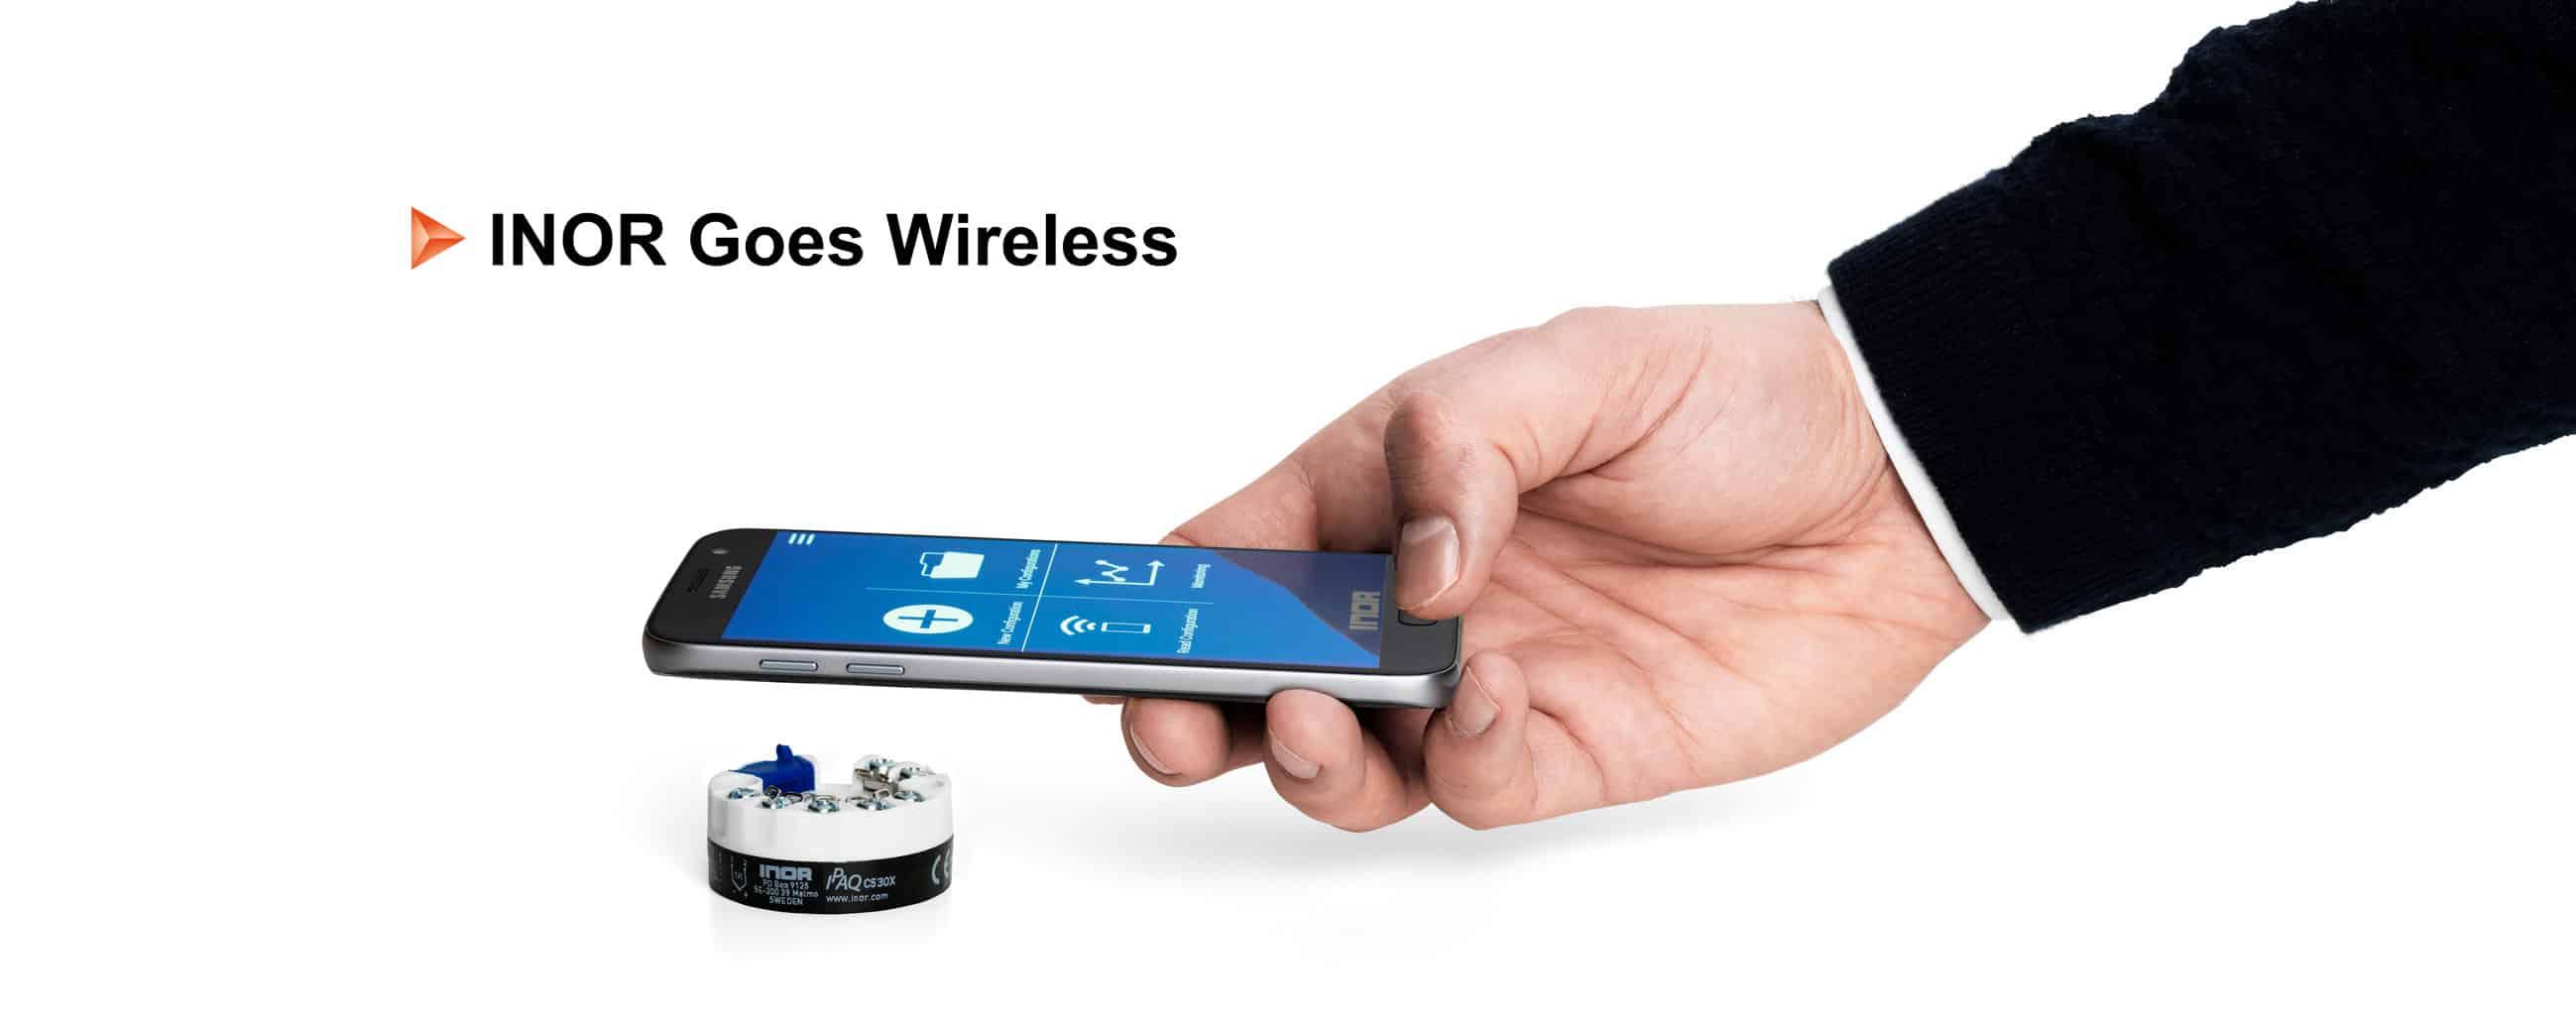 INOR Goes Wireless Concept Header